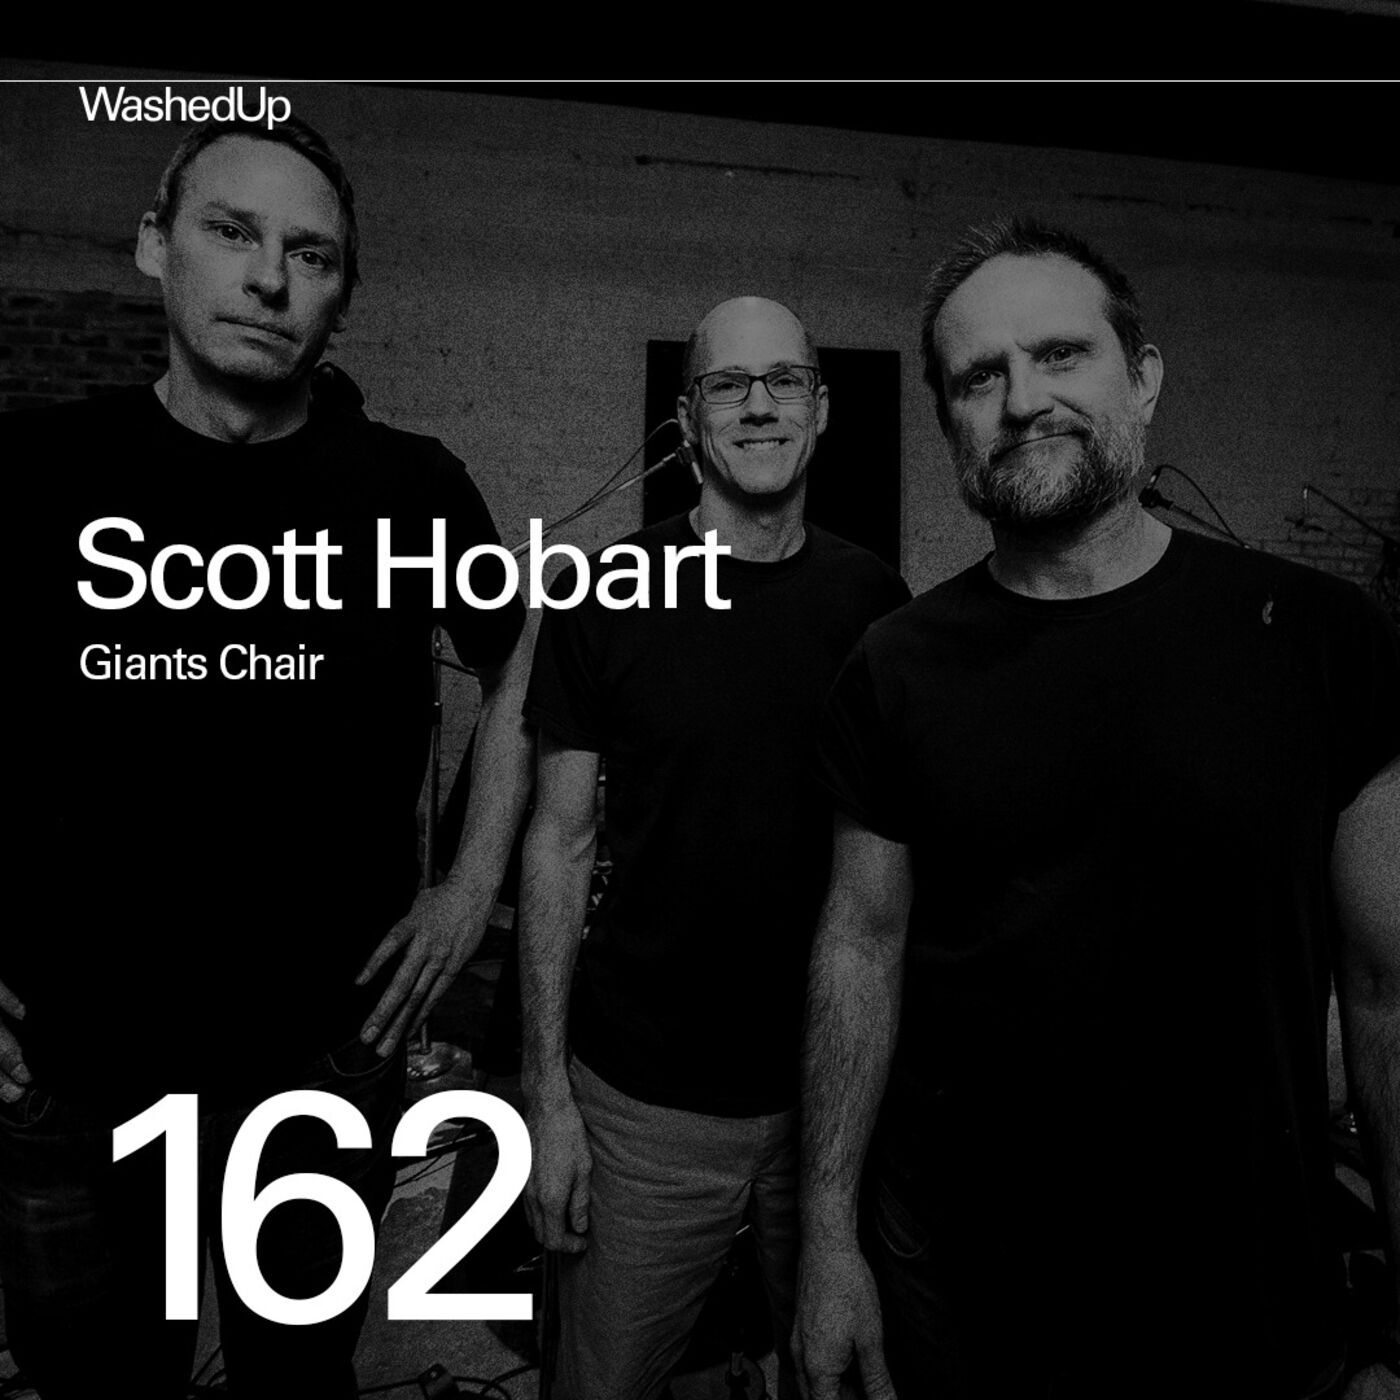 #162 - Scott Hobart (Giants Chair)